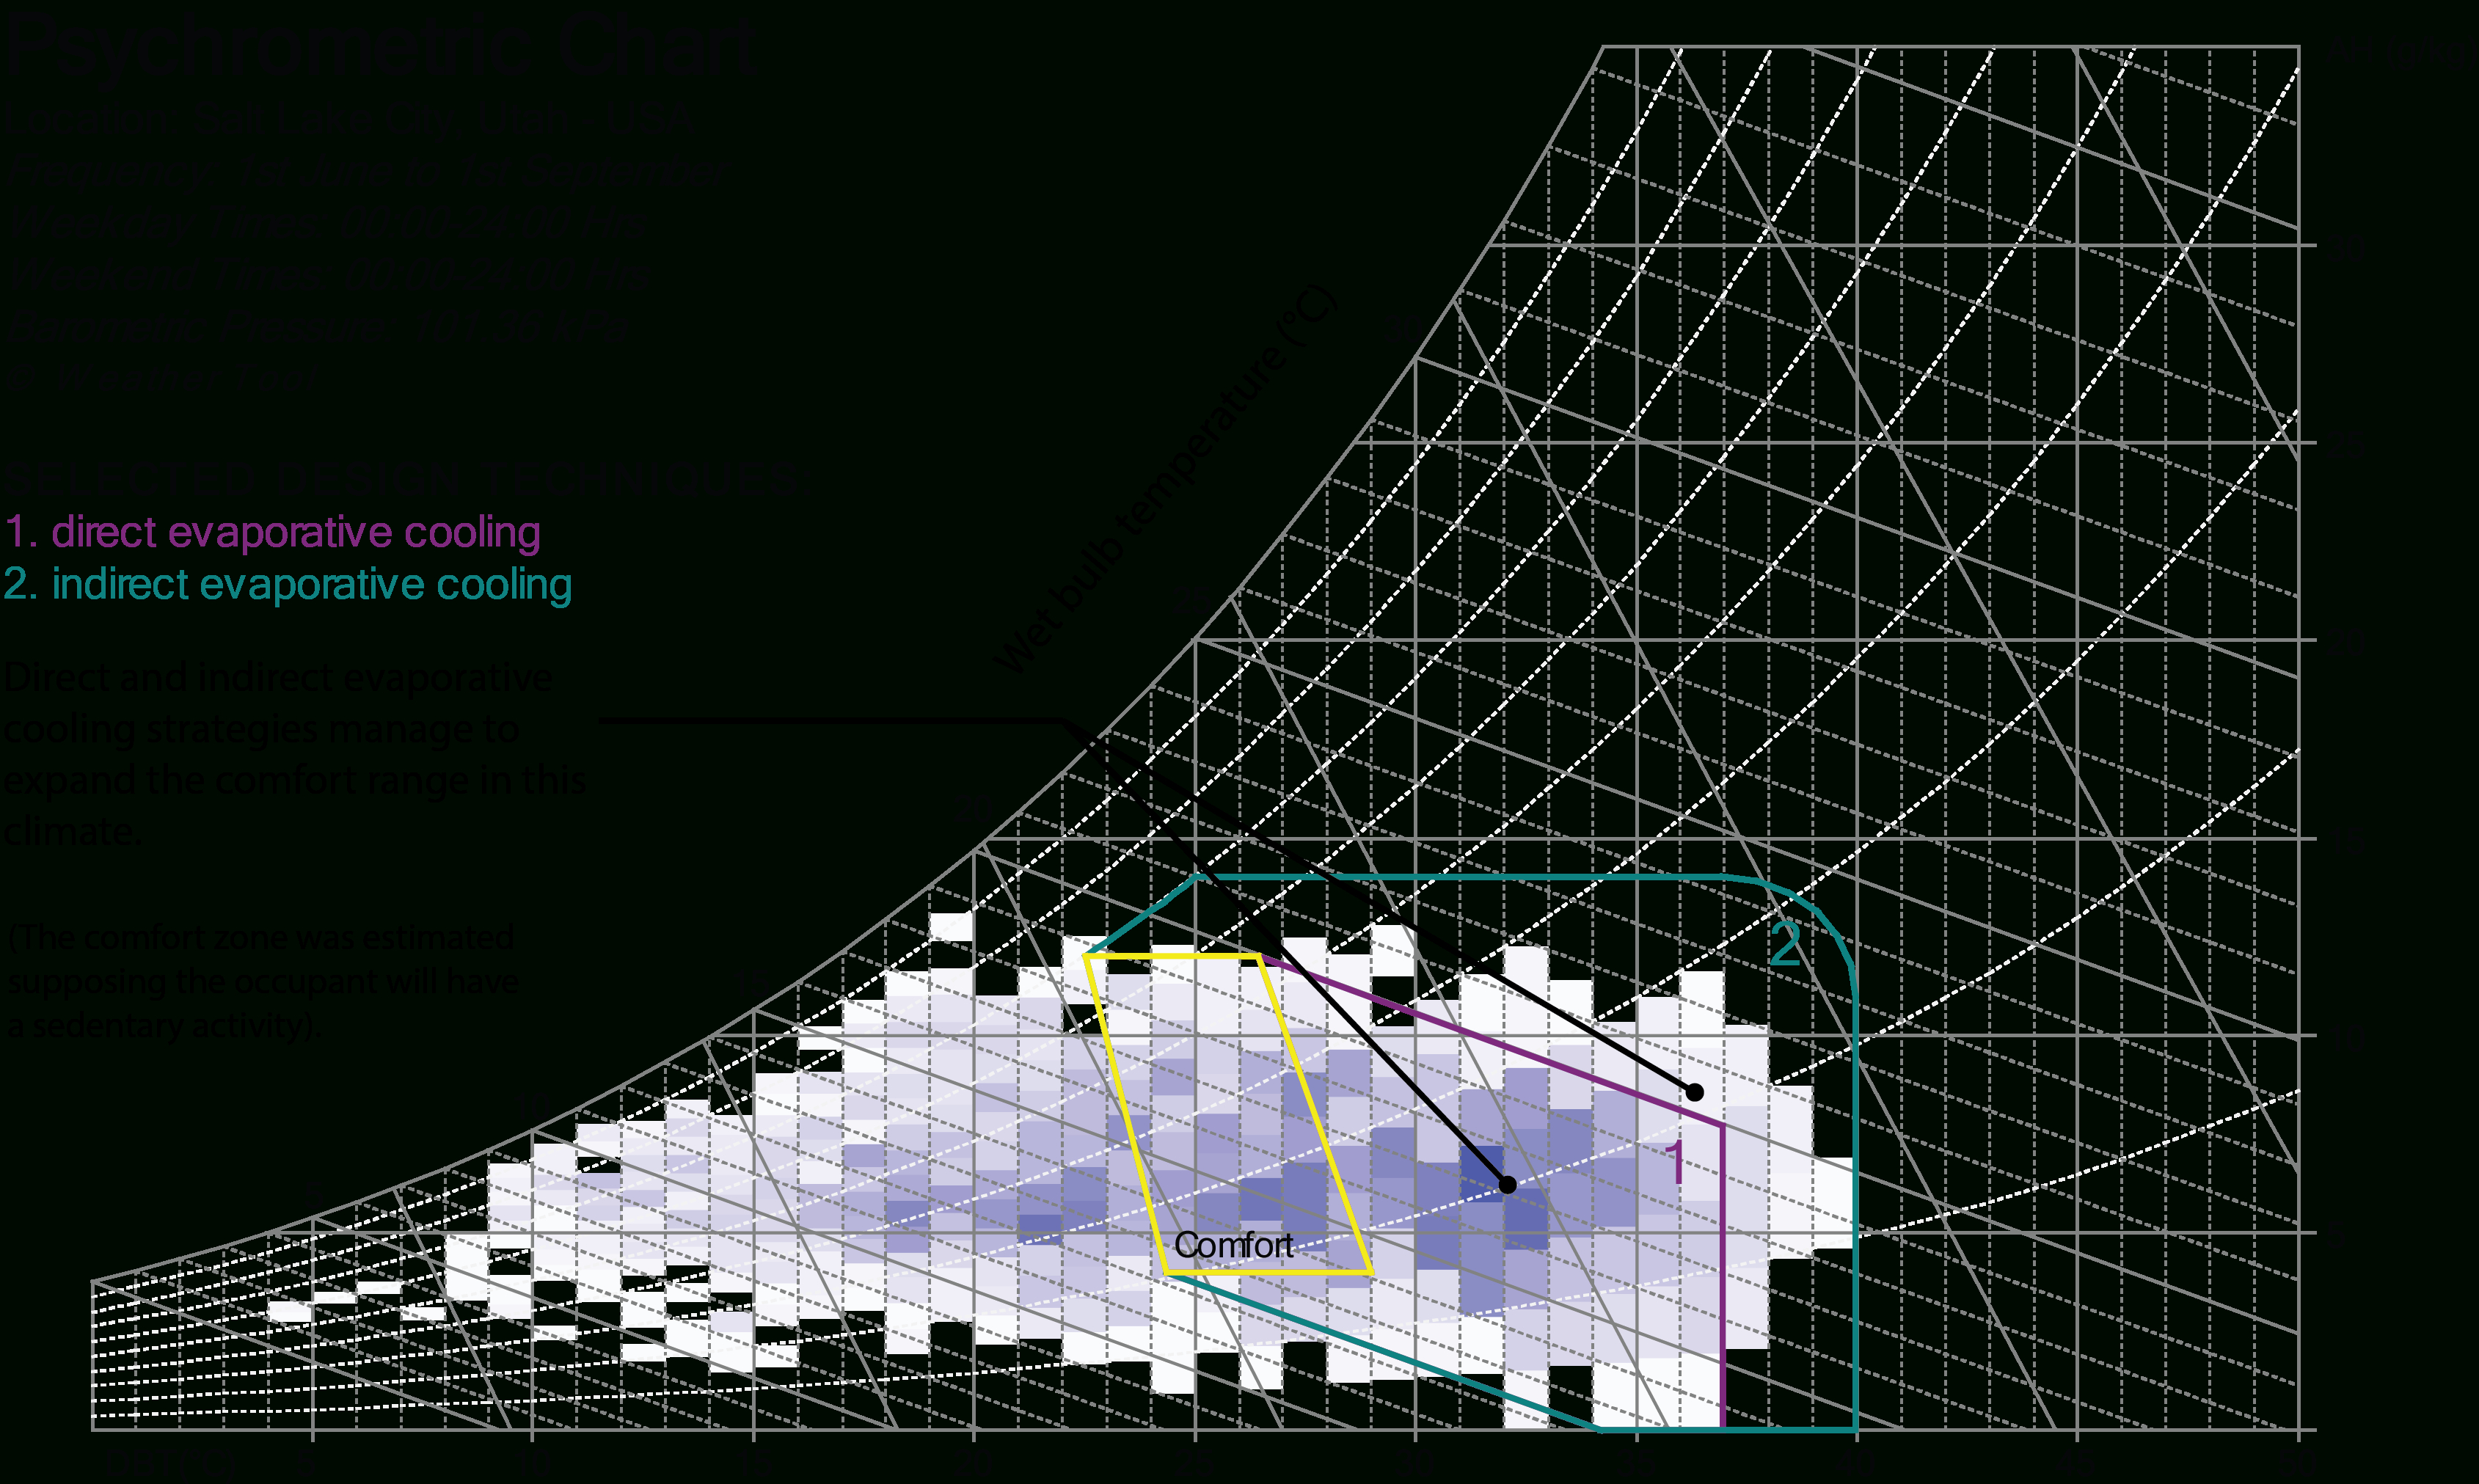 Hd Wallpapers Psychrometric Chart Sensible Heat Ratio Love8Walldesign.cf - Printable Psychrometric Chart Free